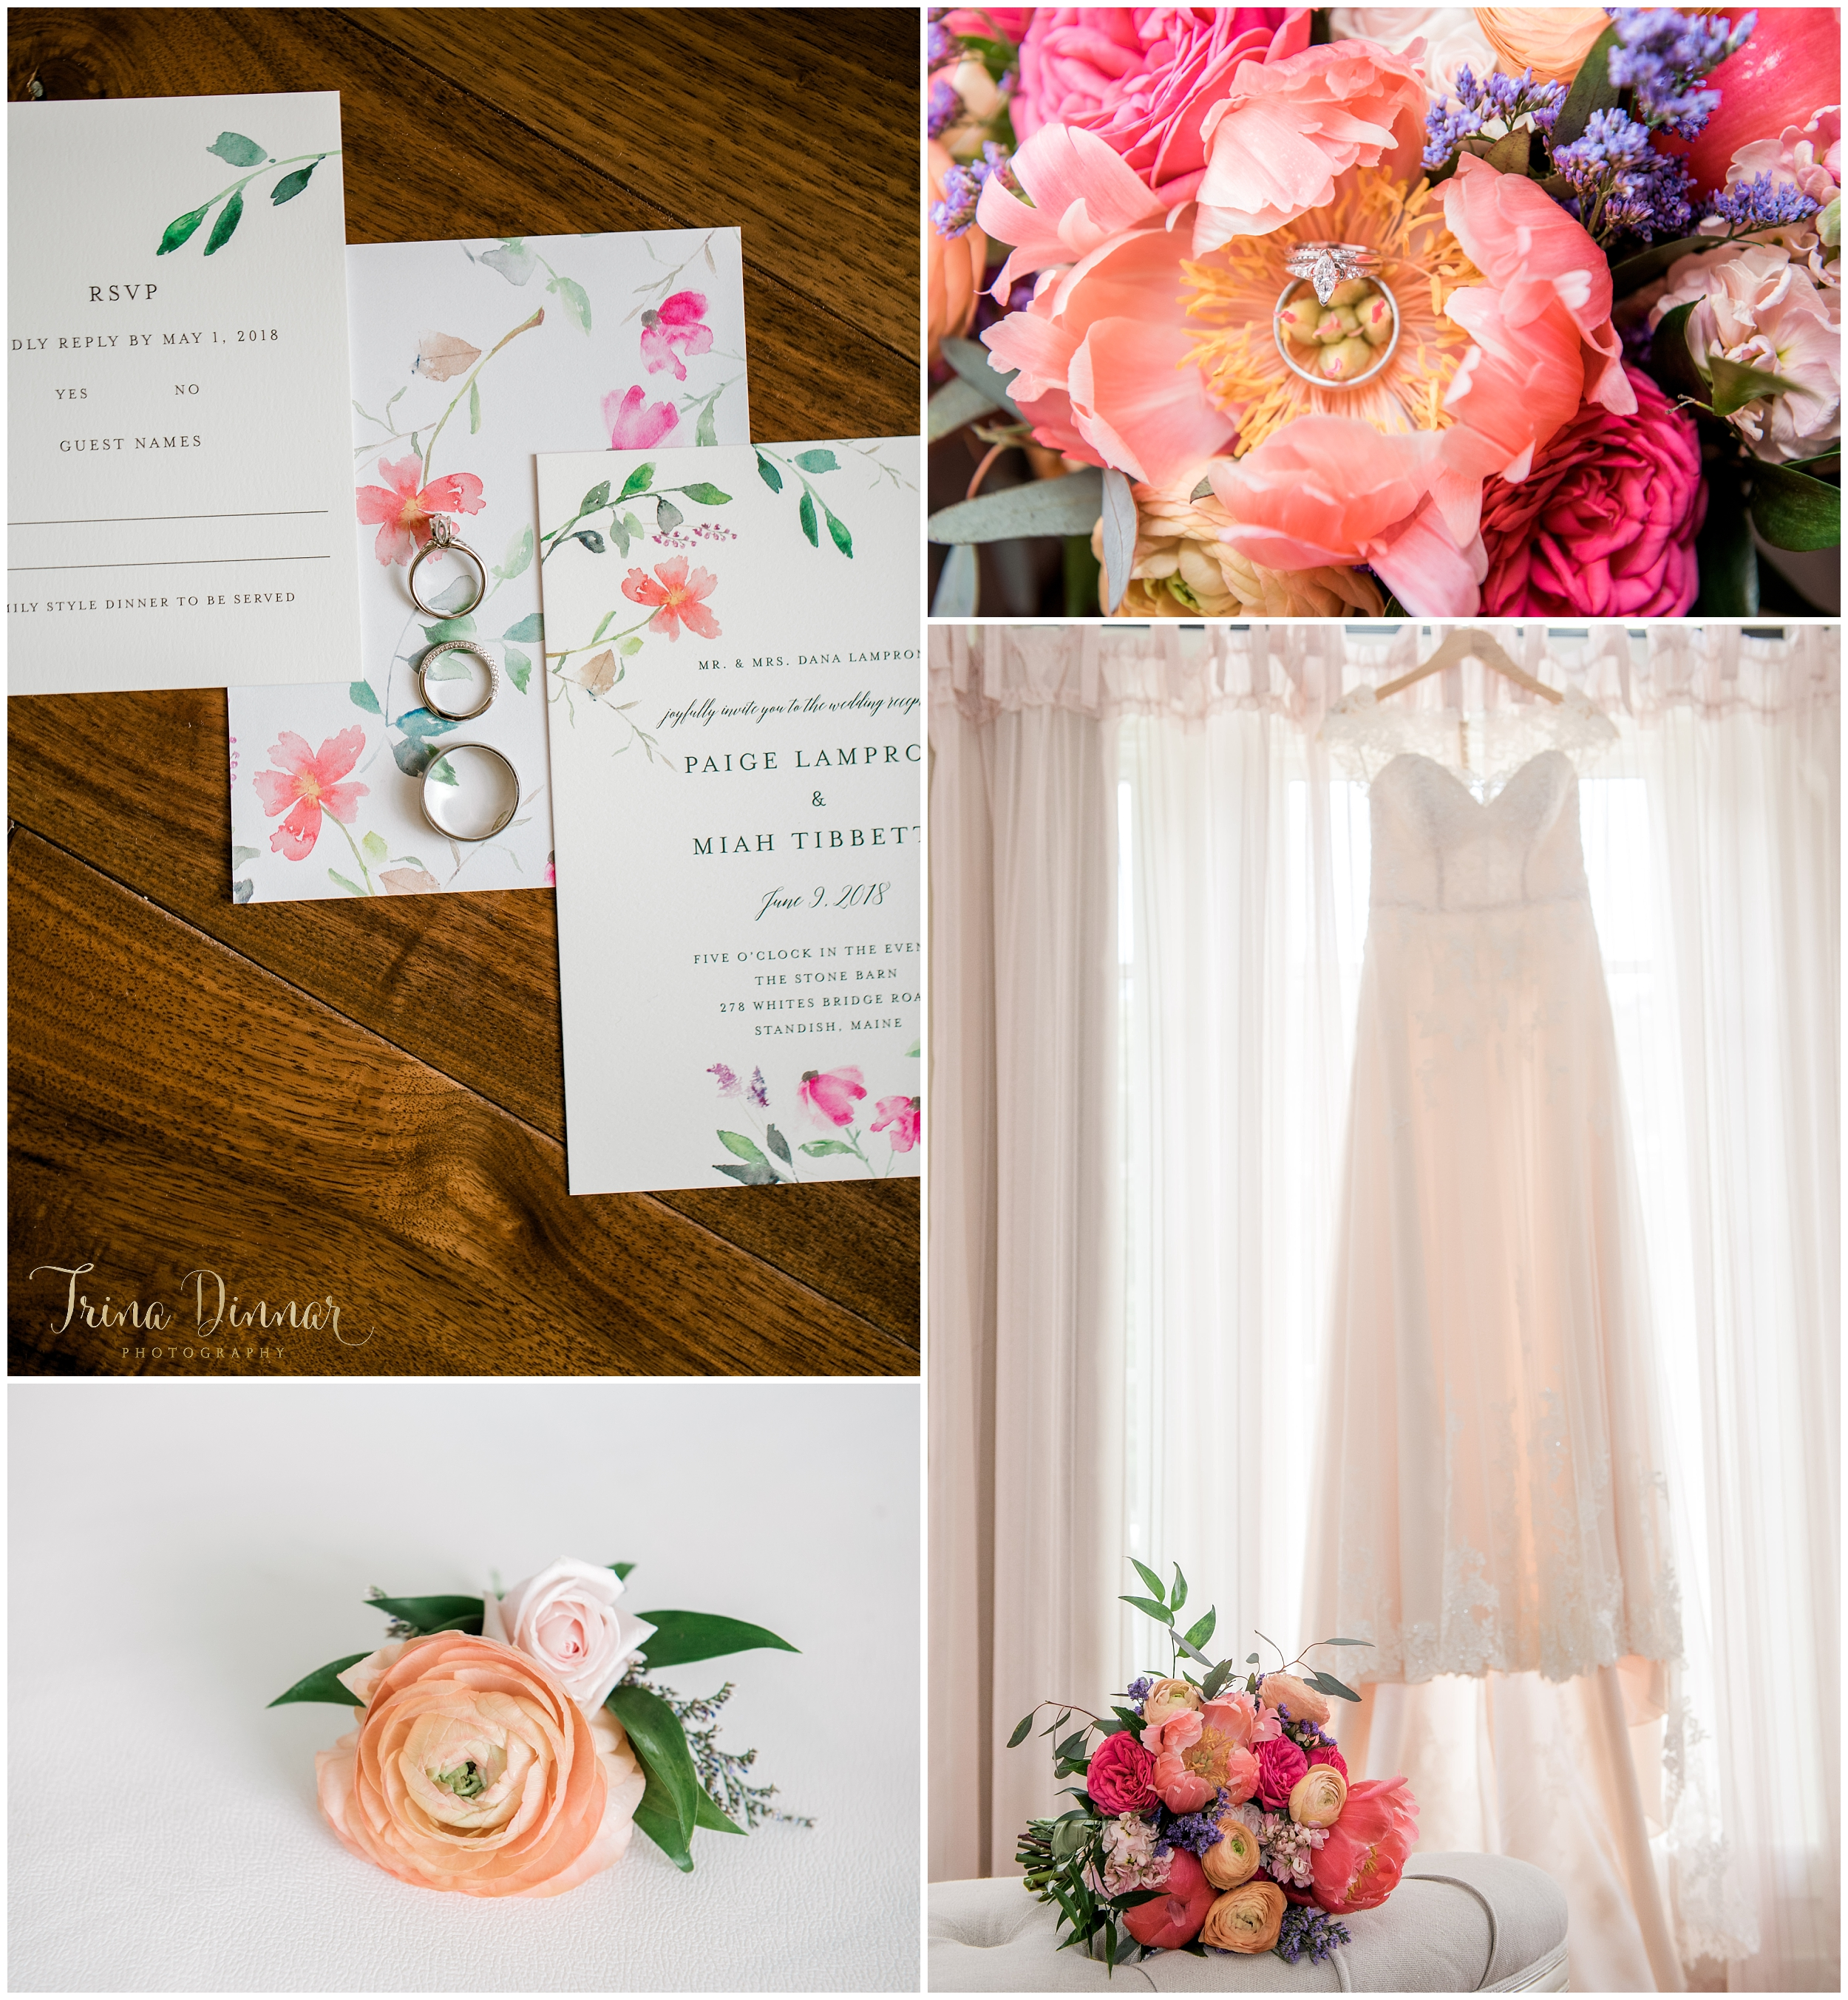 Studio Flora Windham Maine Florist - Flowers and Wedding Details